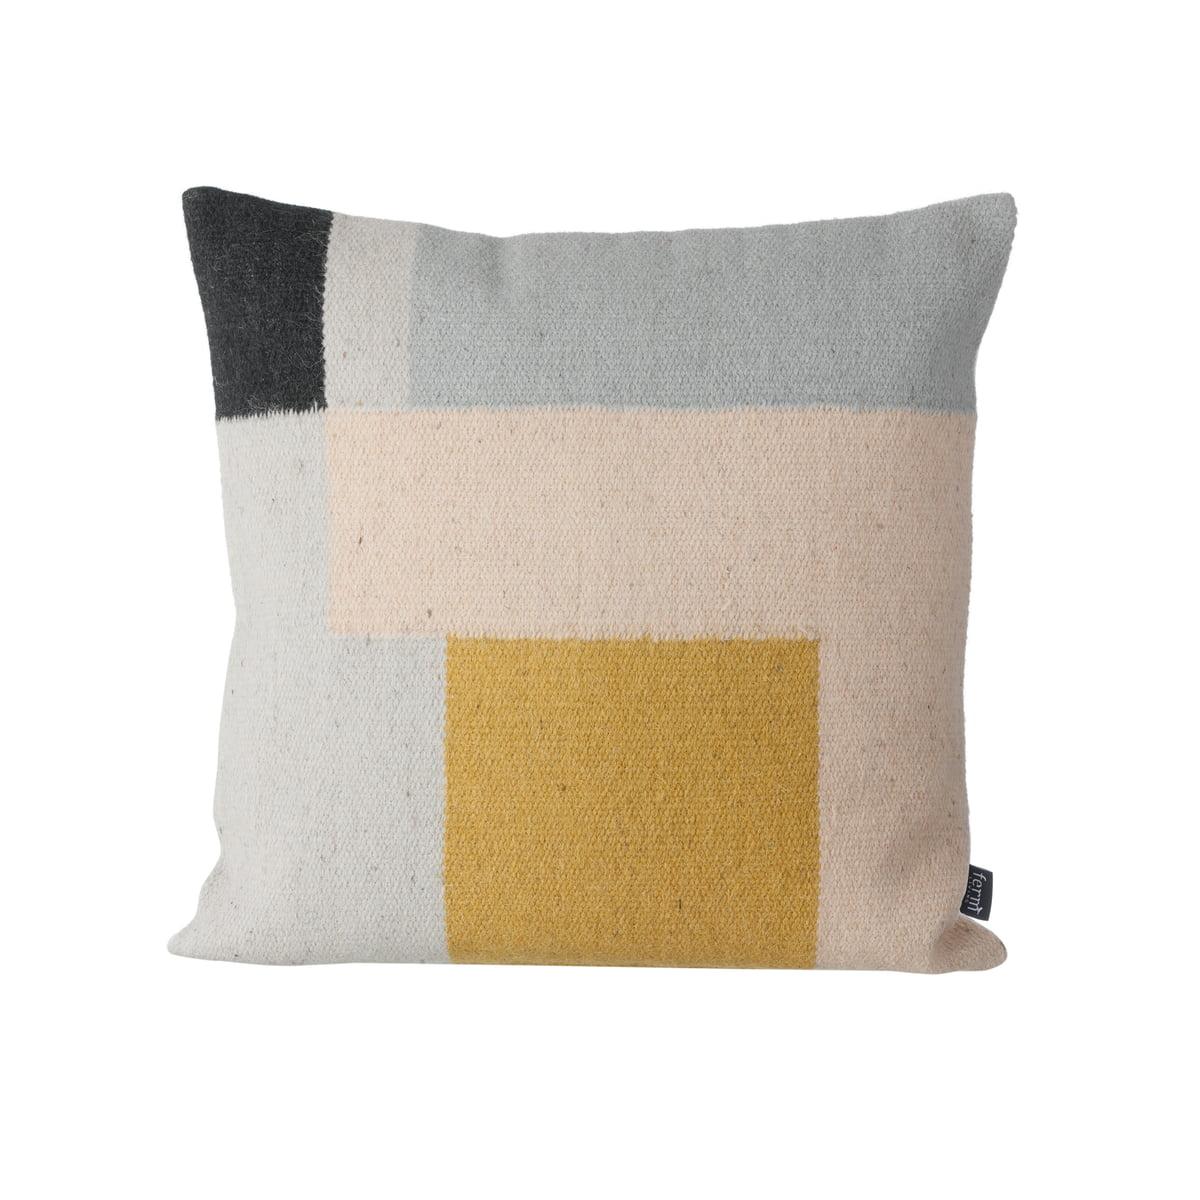 kelim cushion von ferm living im shop. Black Bedroom Furniture Sets. Home Design Ideas